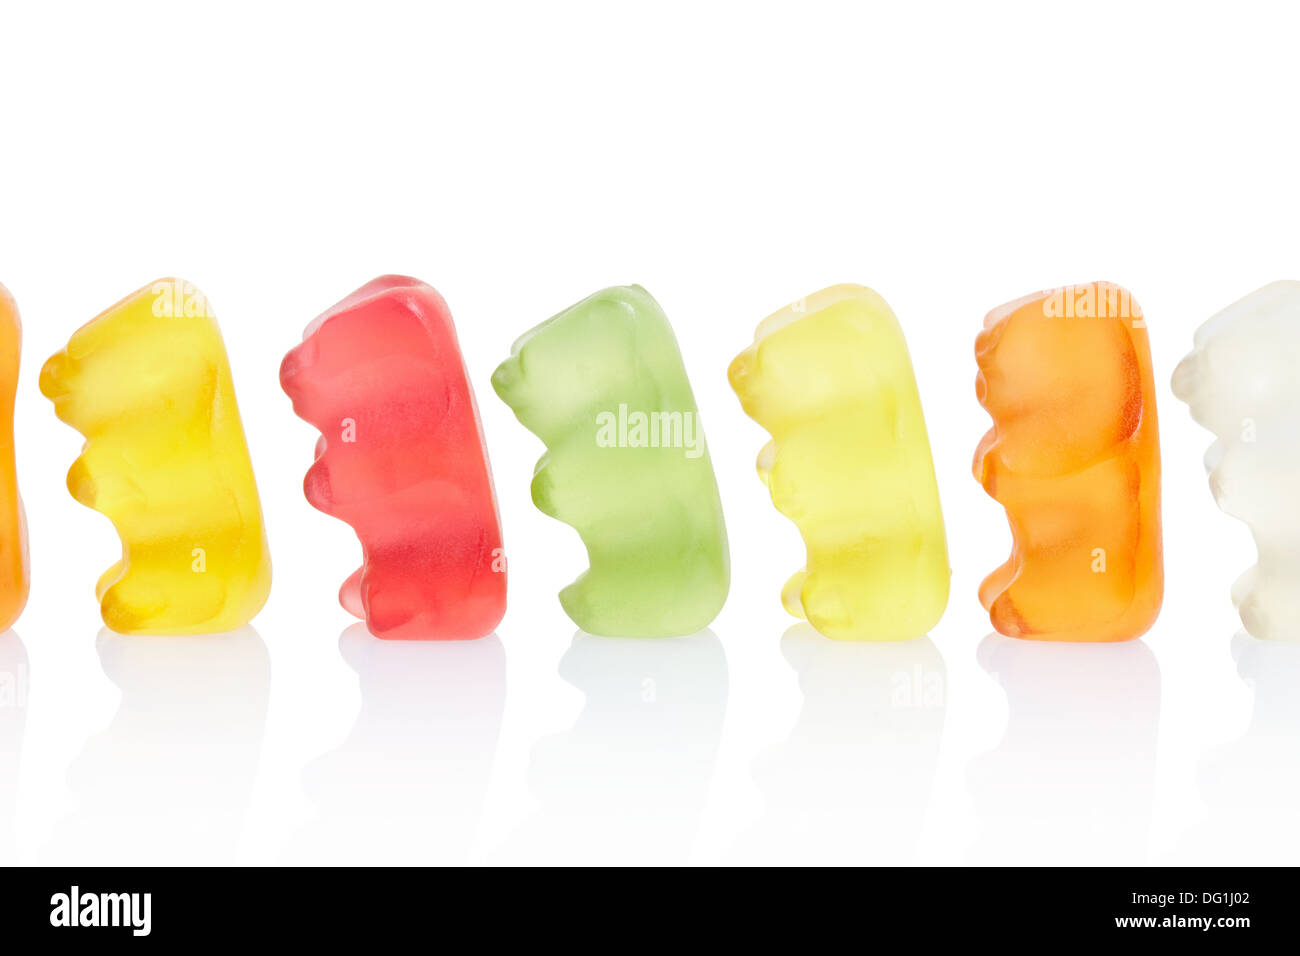 Gummy bears, queue concept - Stock Image